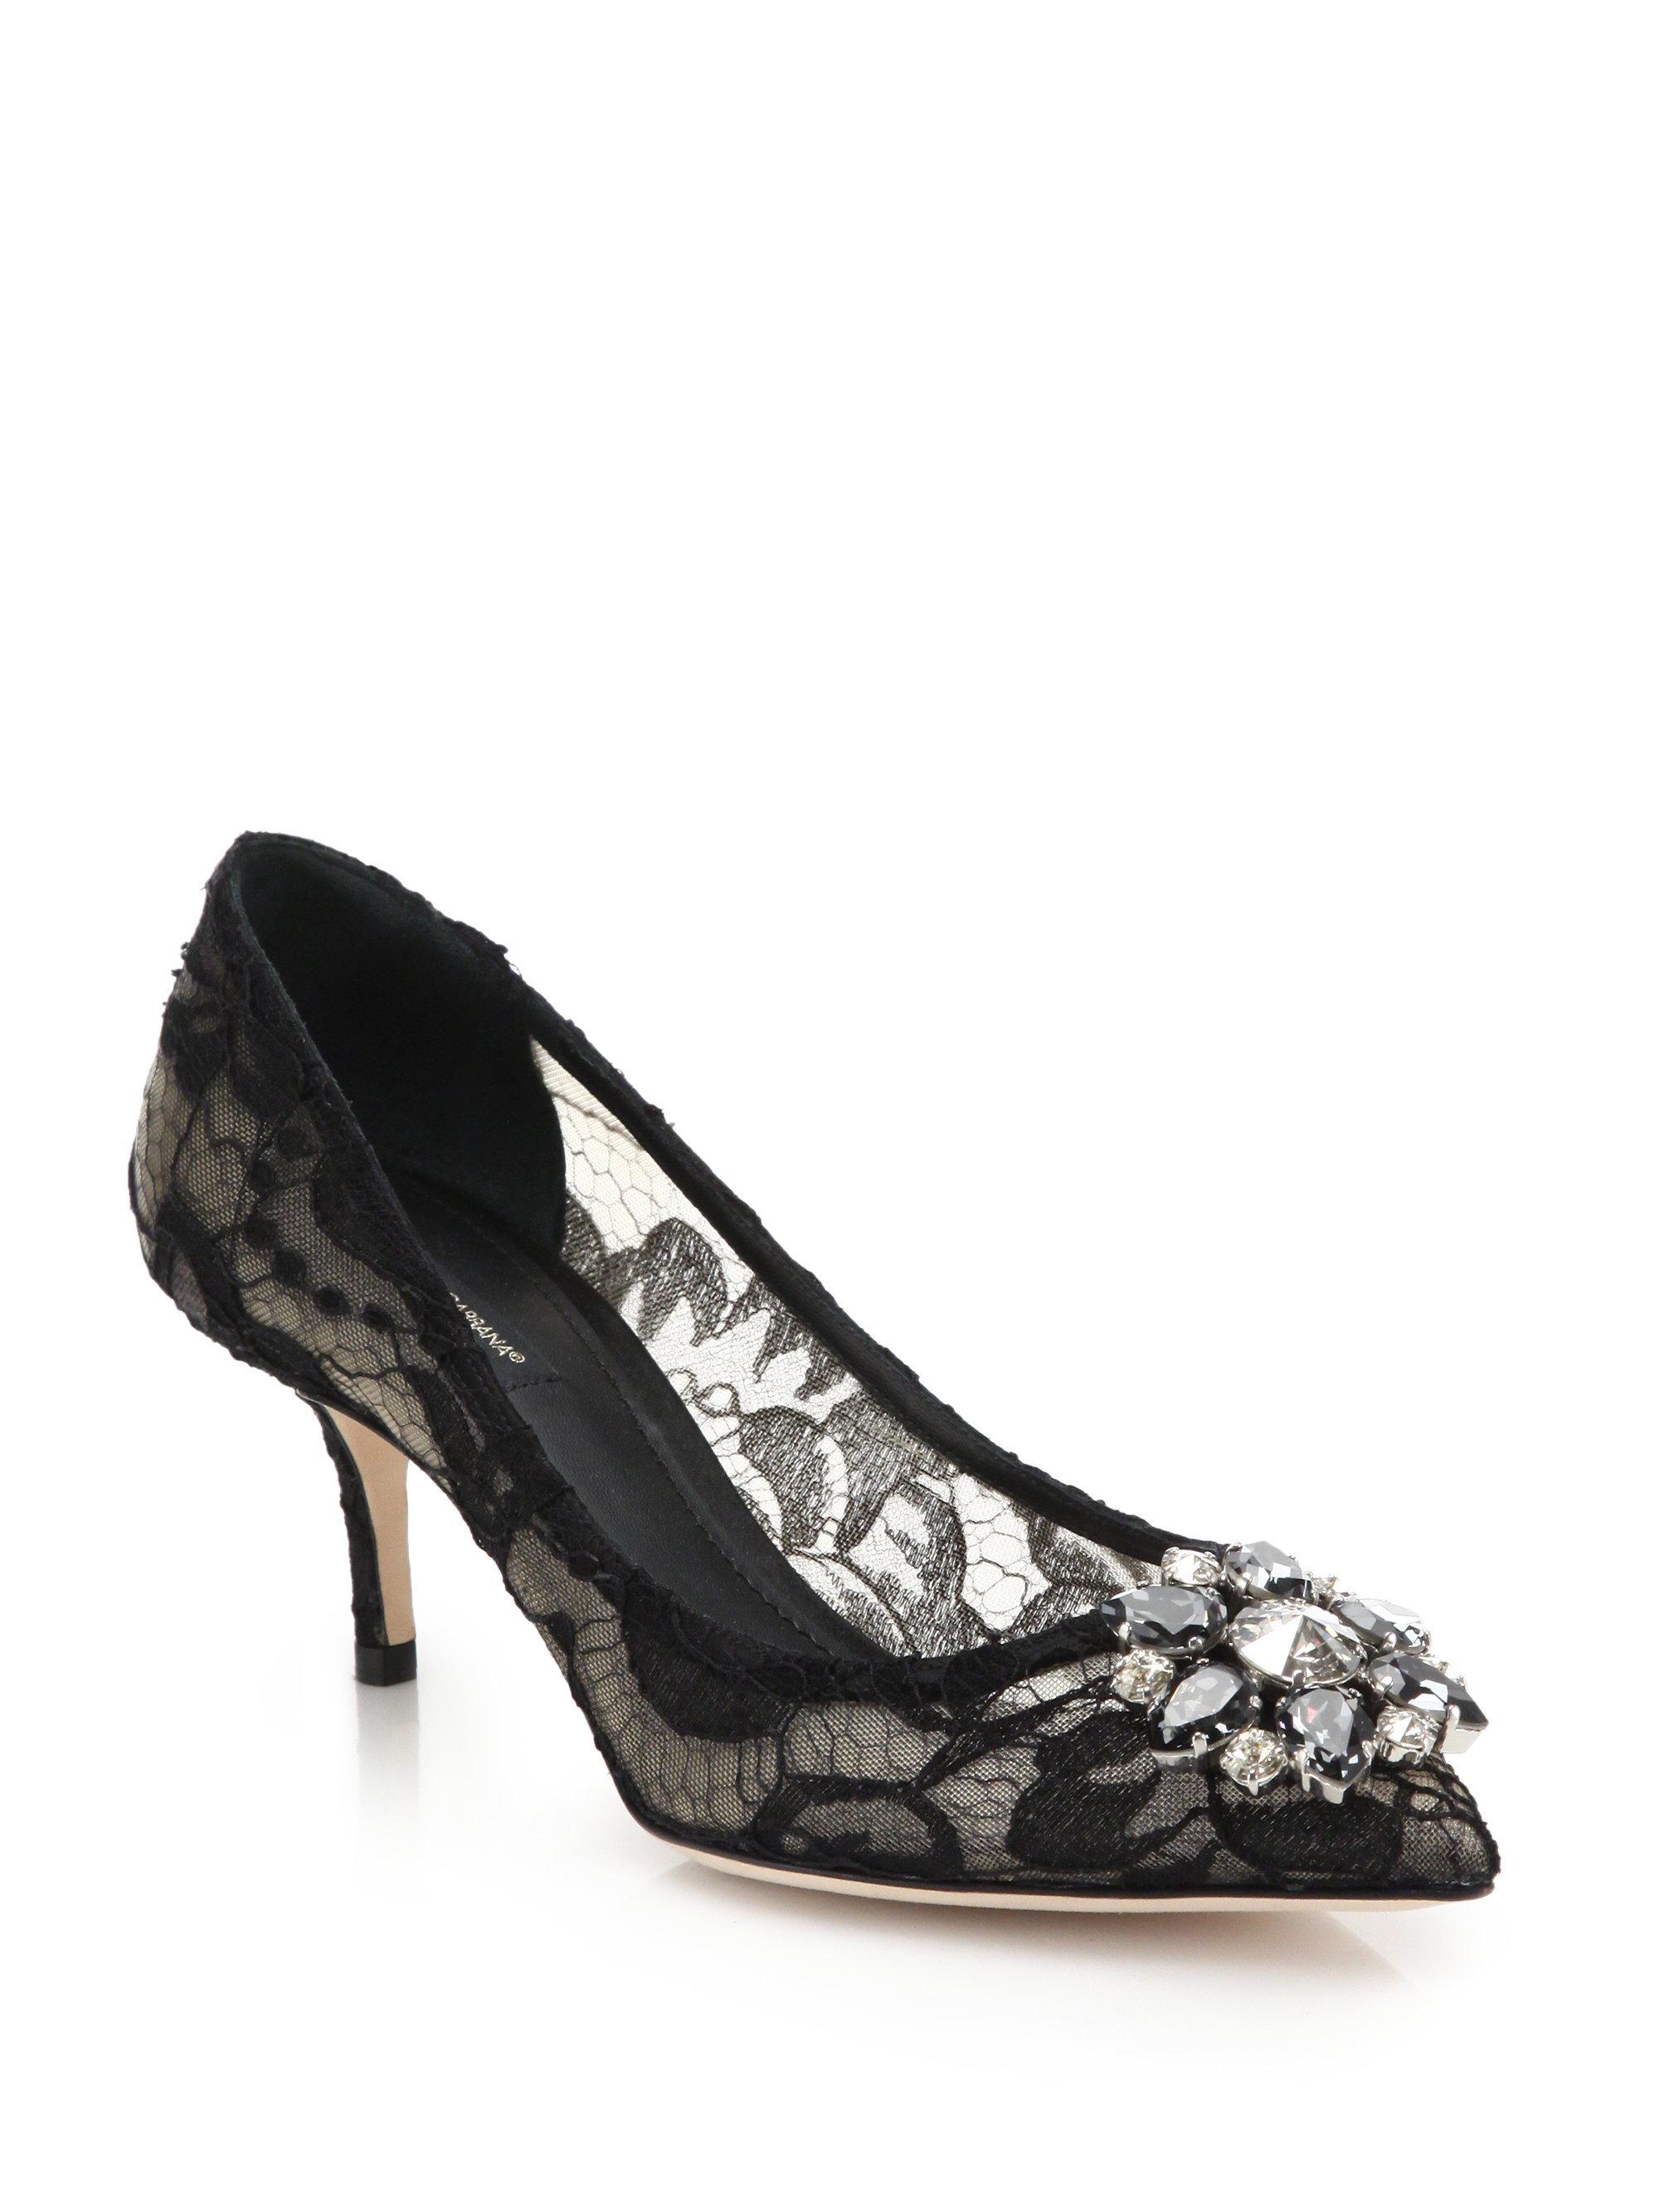 Dolce & Gabbana. Women's Black Embellished Lace Point Toe Pumps